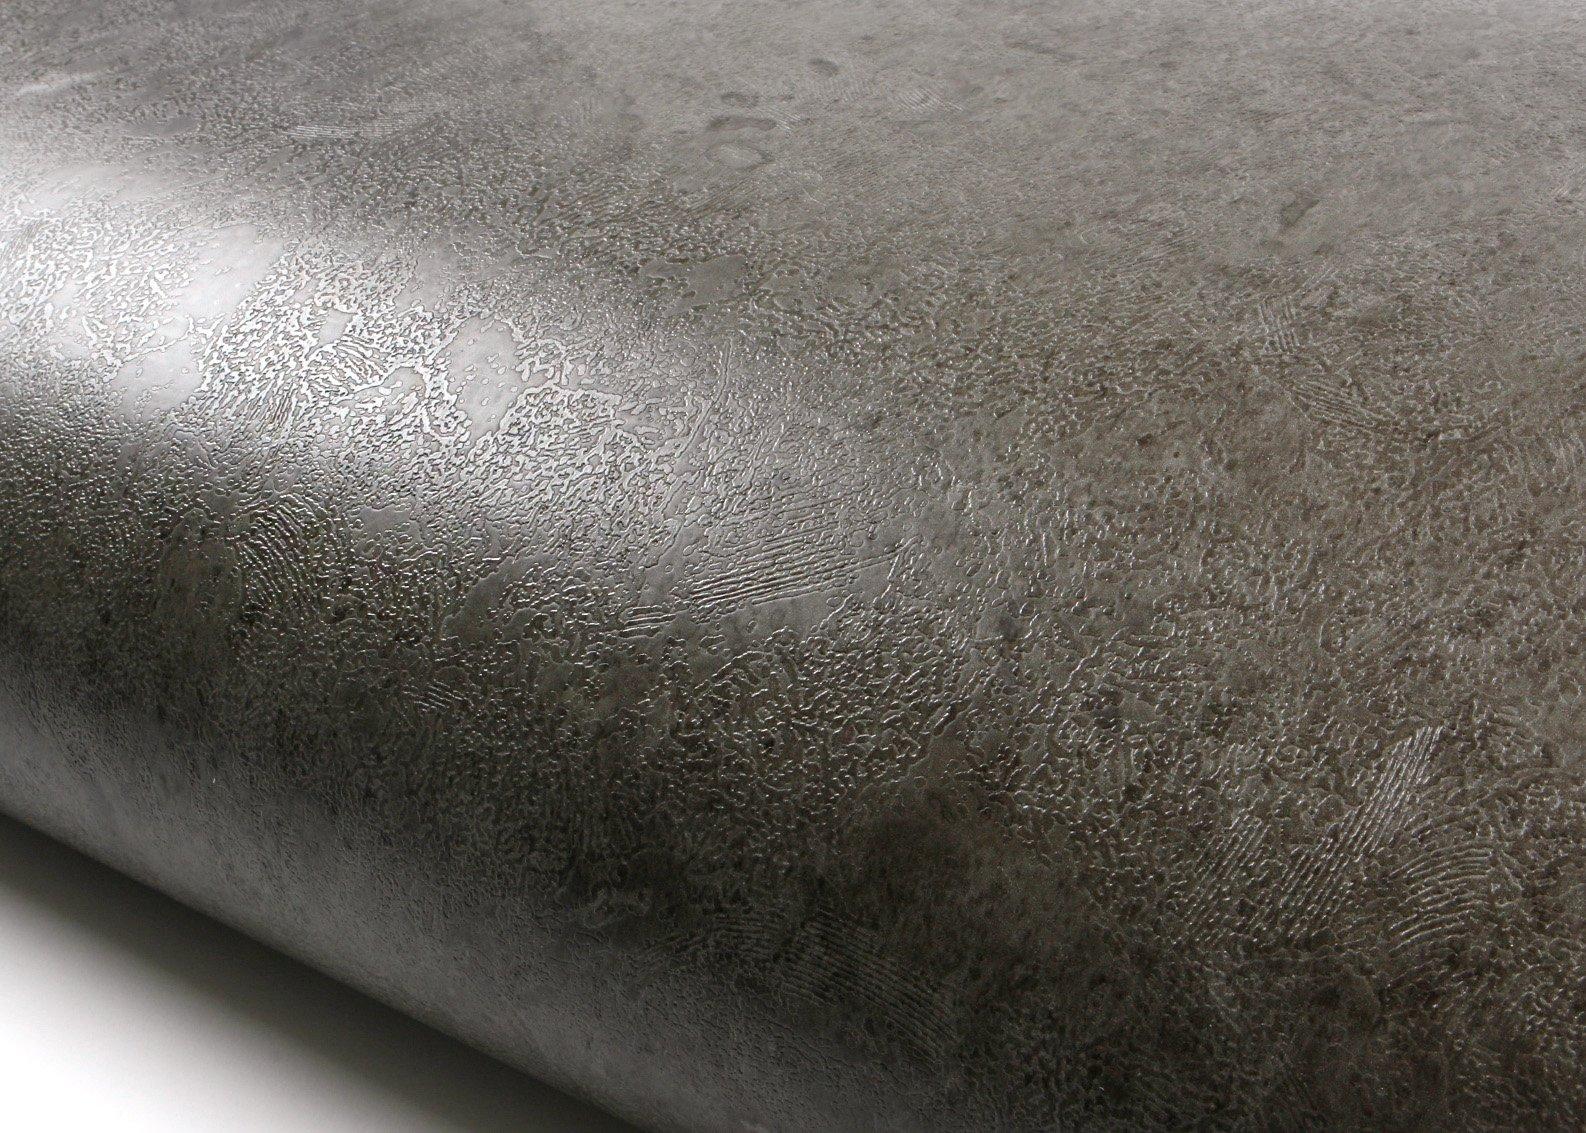 ROSEROSA Peel & Stick Rust Brick Pattern Backsplash Slate Stone Concrete Contact Paper Self-Adhesive Wallpaper Shelf Liner Table and Door Reform (SMF749 : 2.00 Feet X 6.56 Feet)